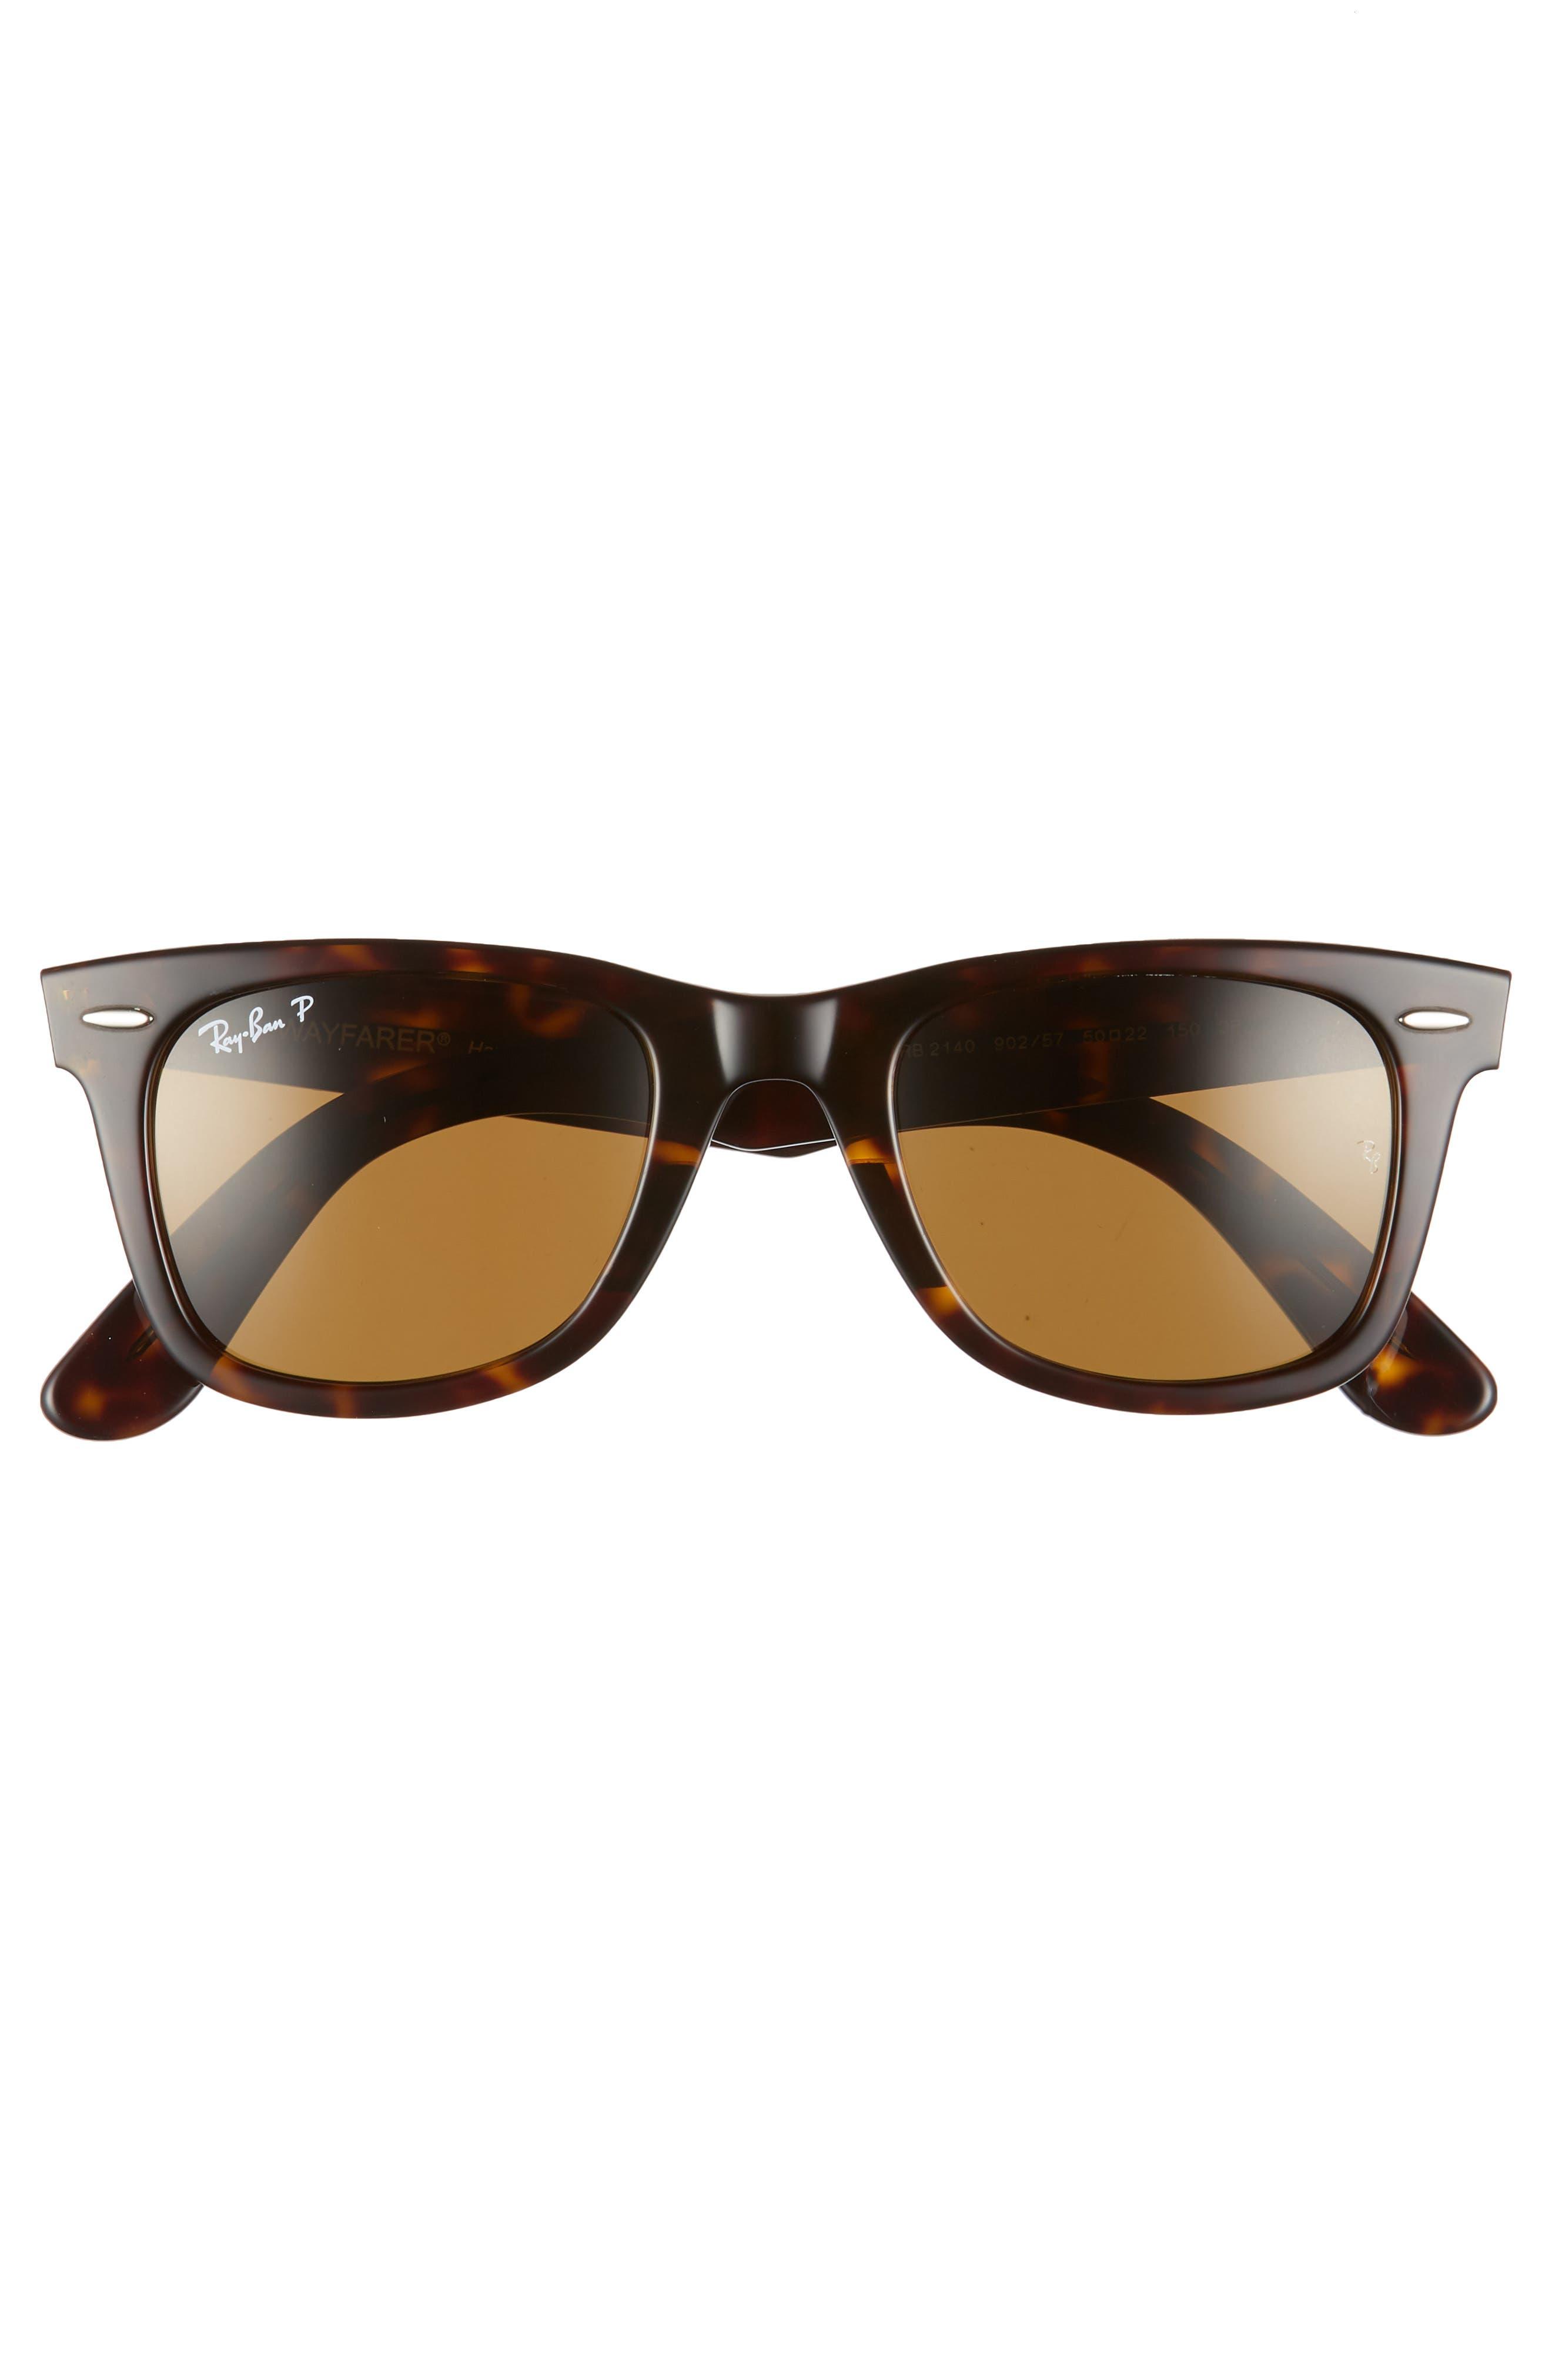 Standard Classic Wayfarer 50mm Polarized Sunglasses,                             Alternate thumbnail 3, color,                             205